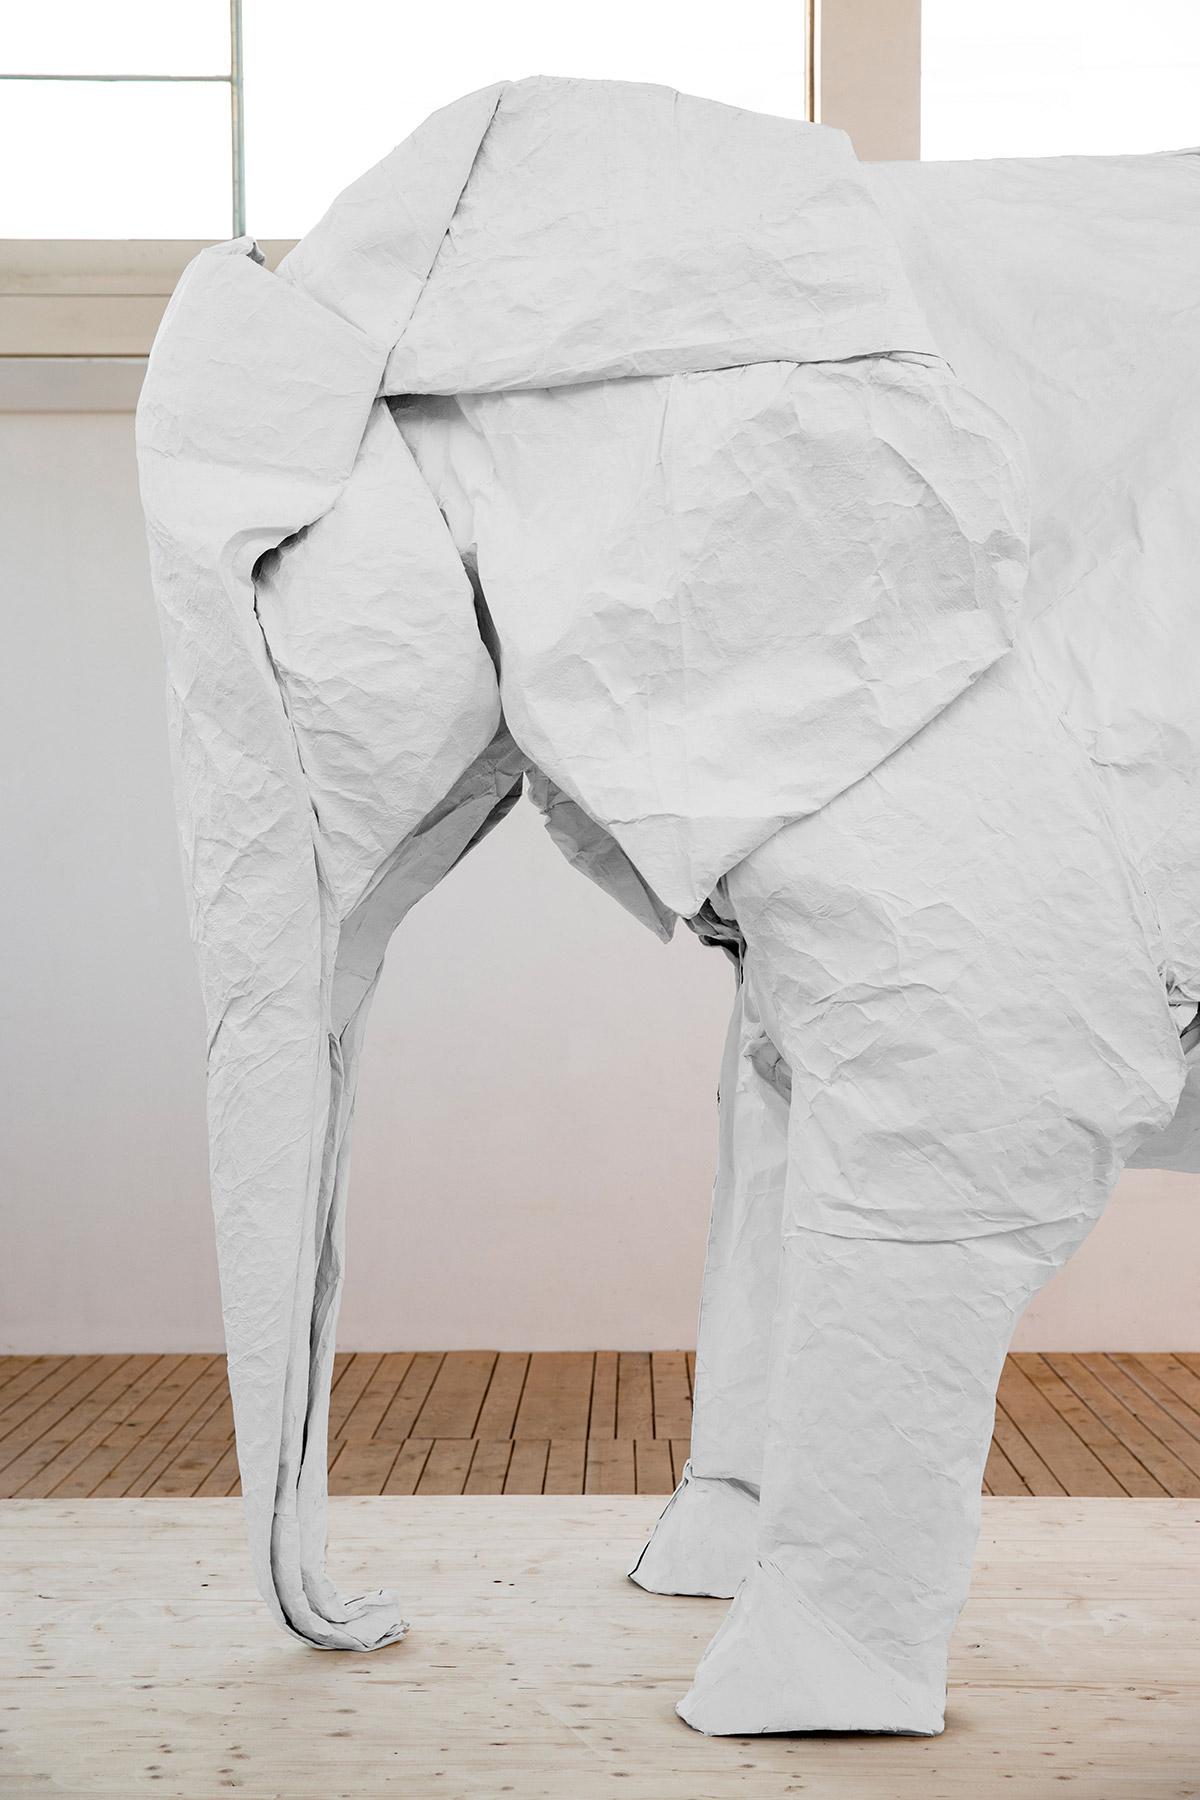 paper-elephant-sipho-mabona-02